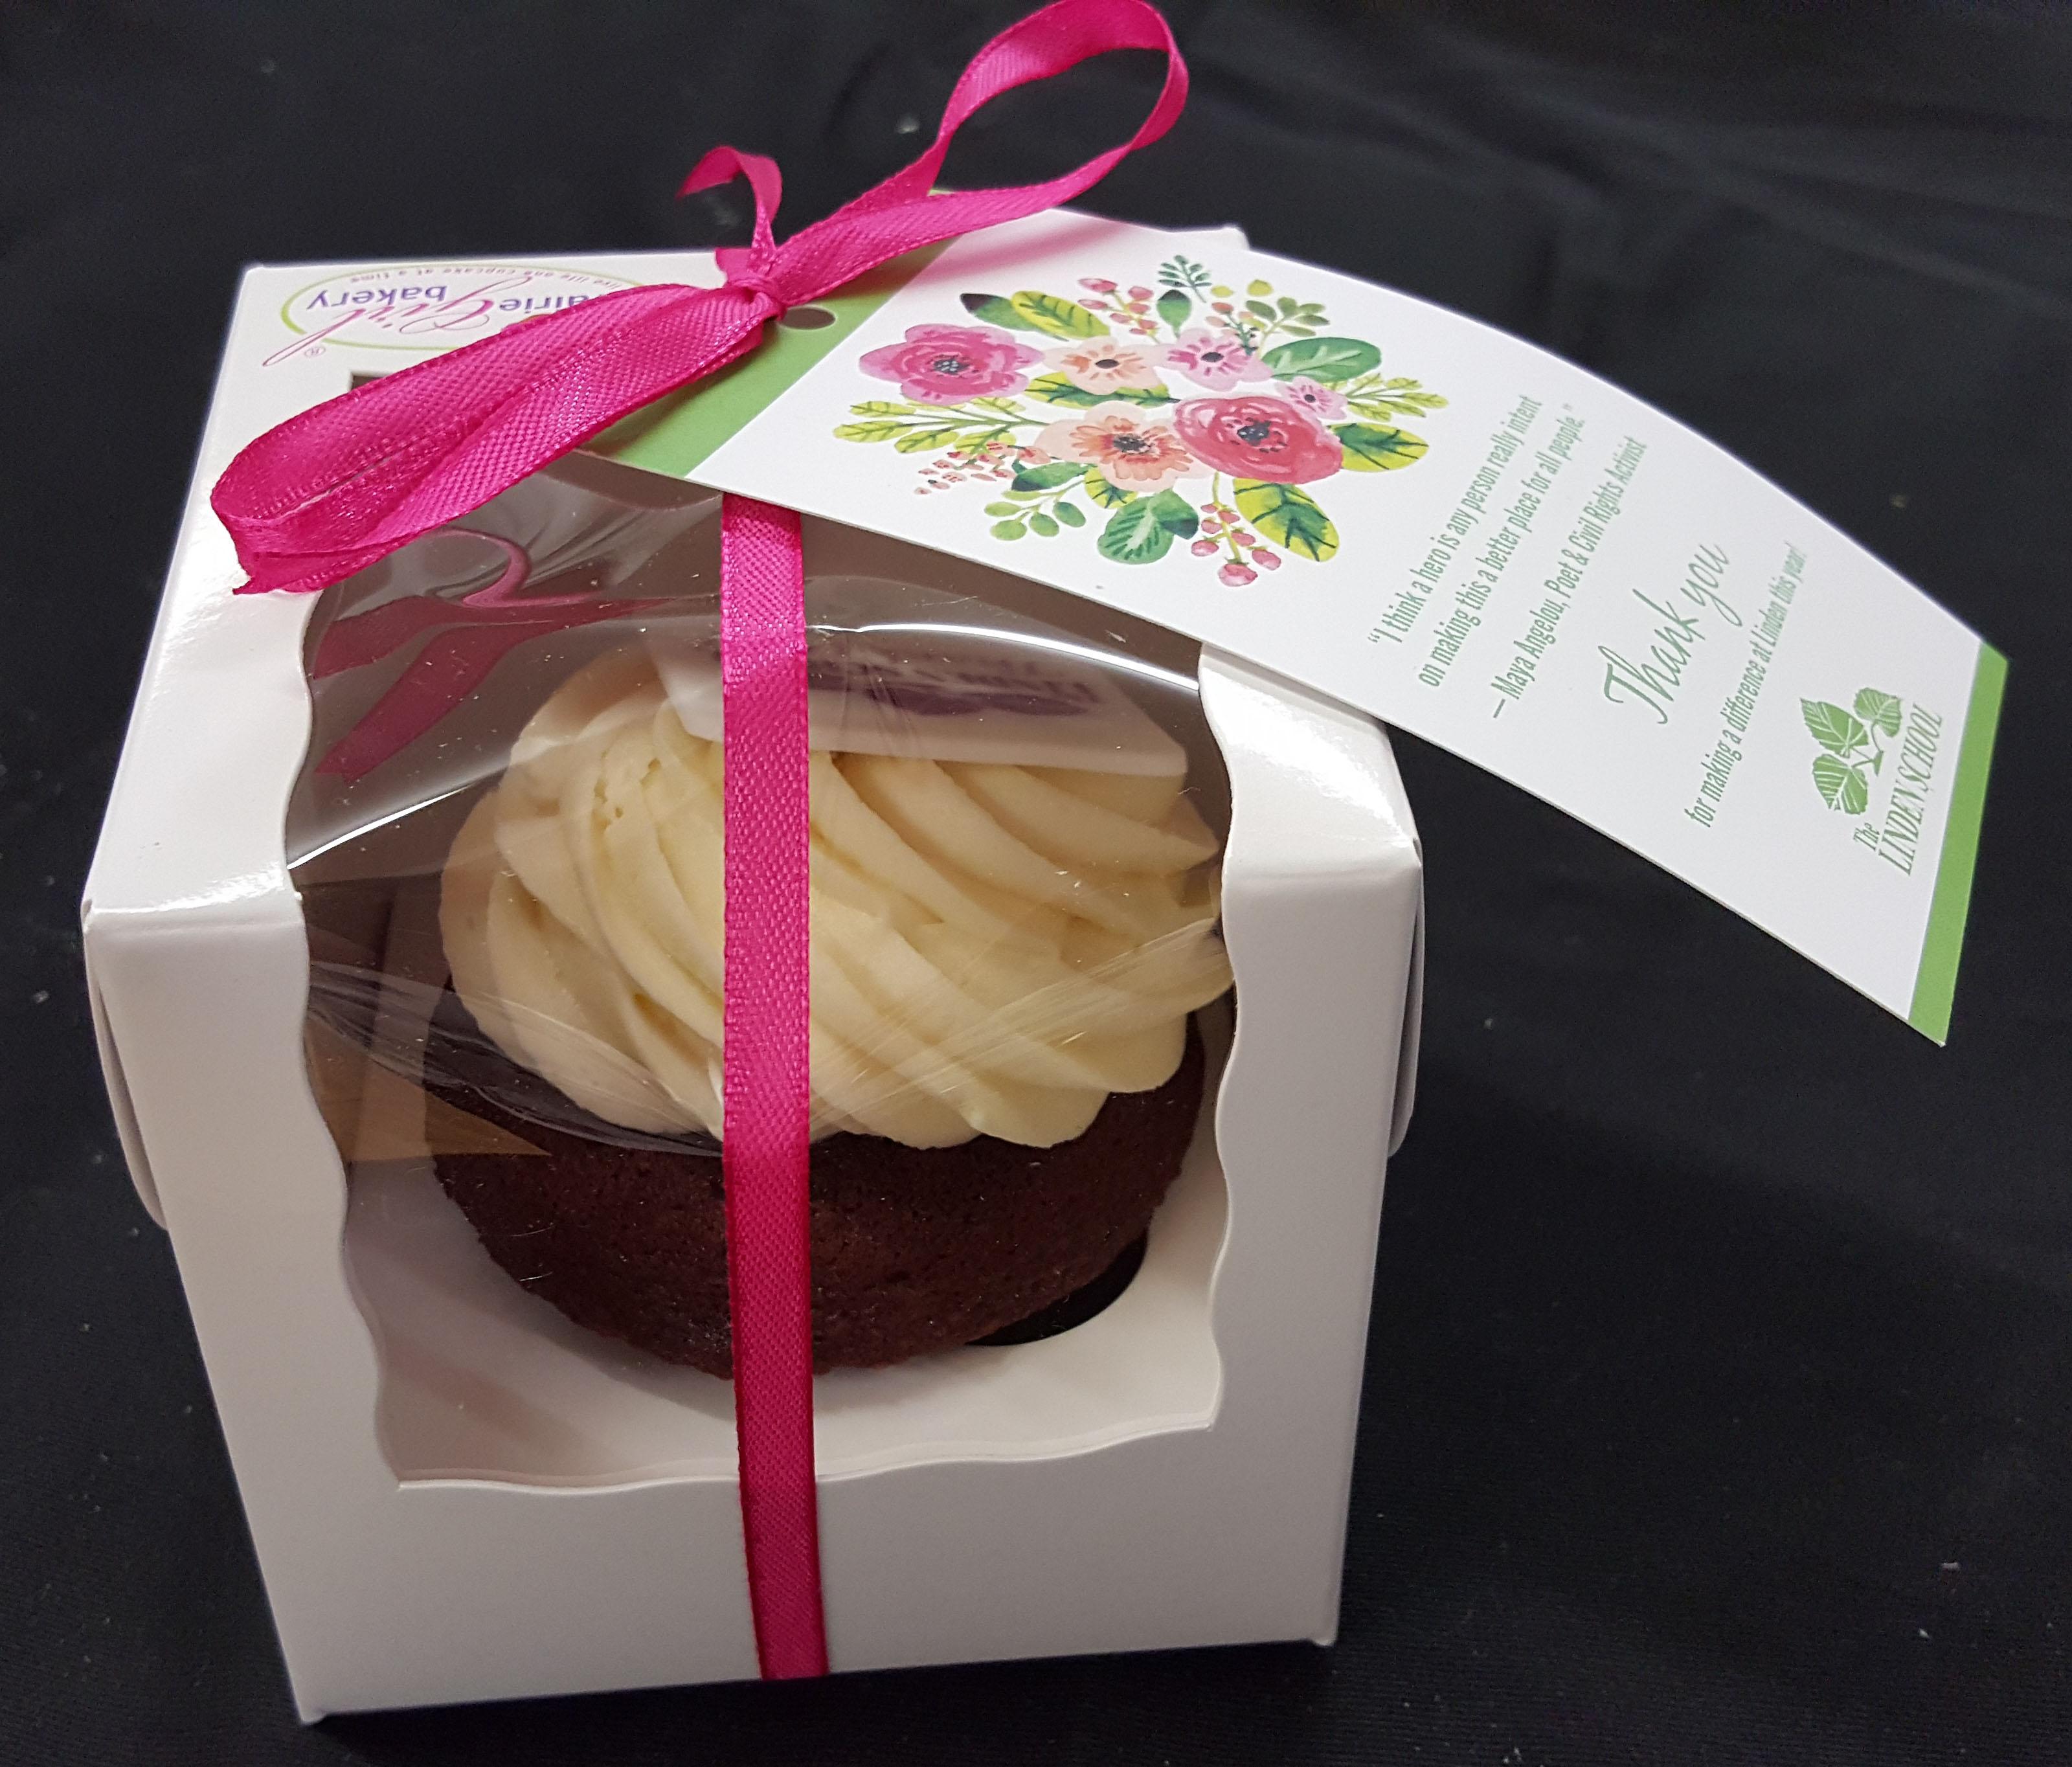 CupcakesVol.jpg